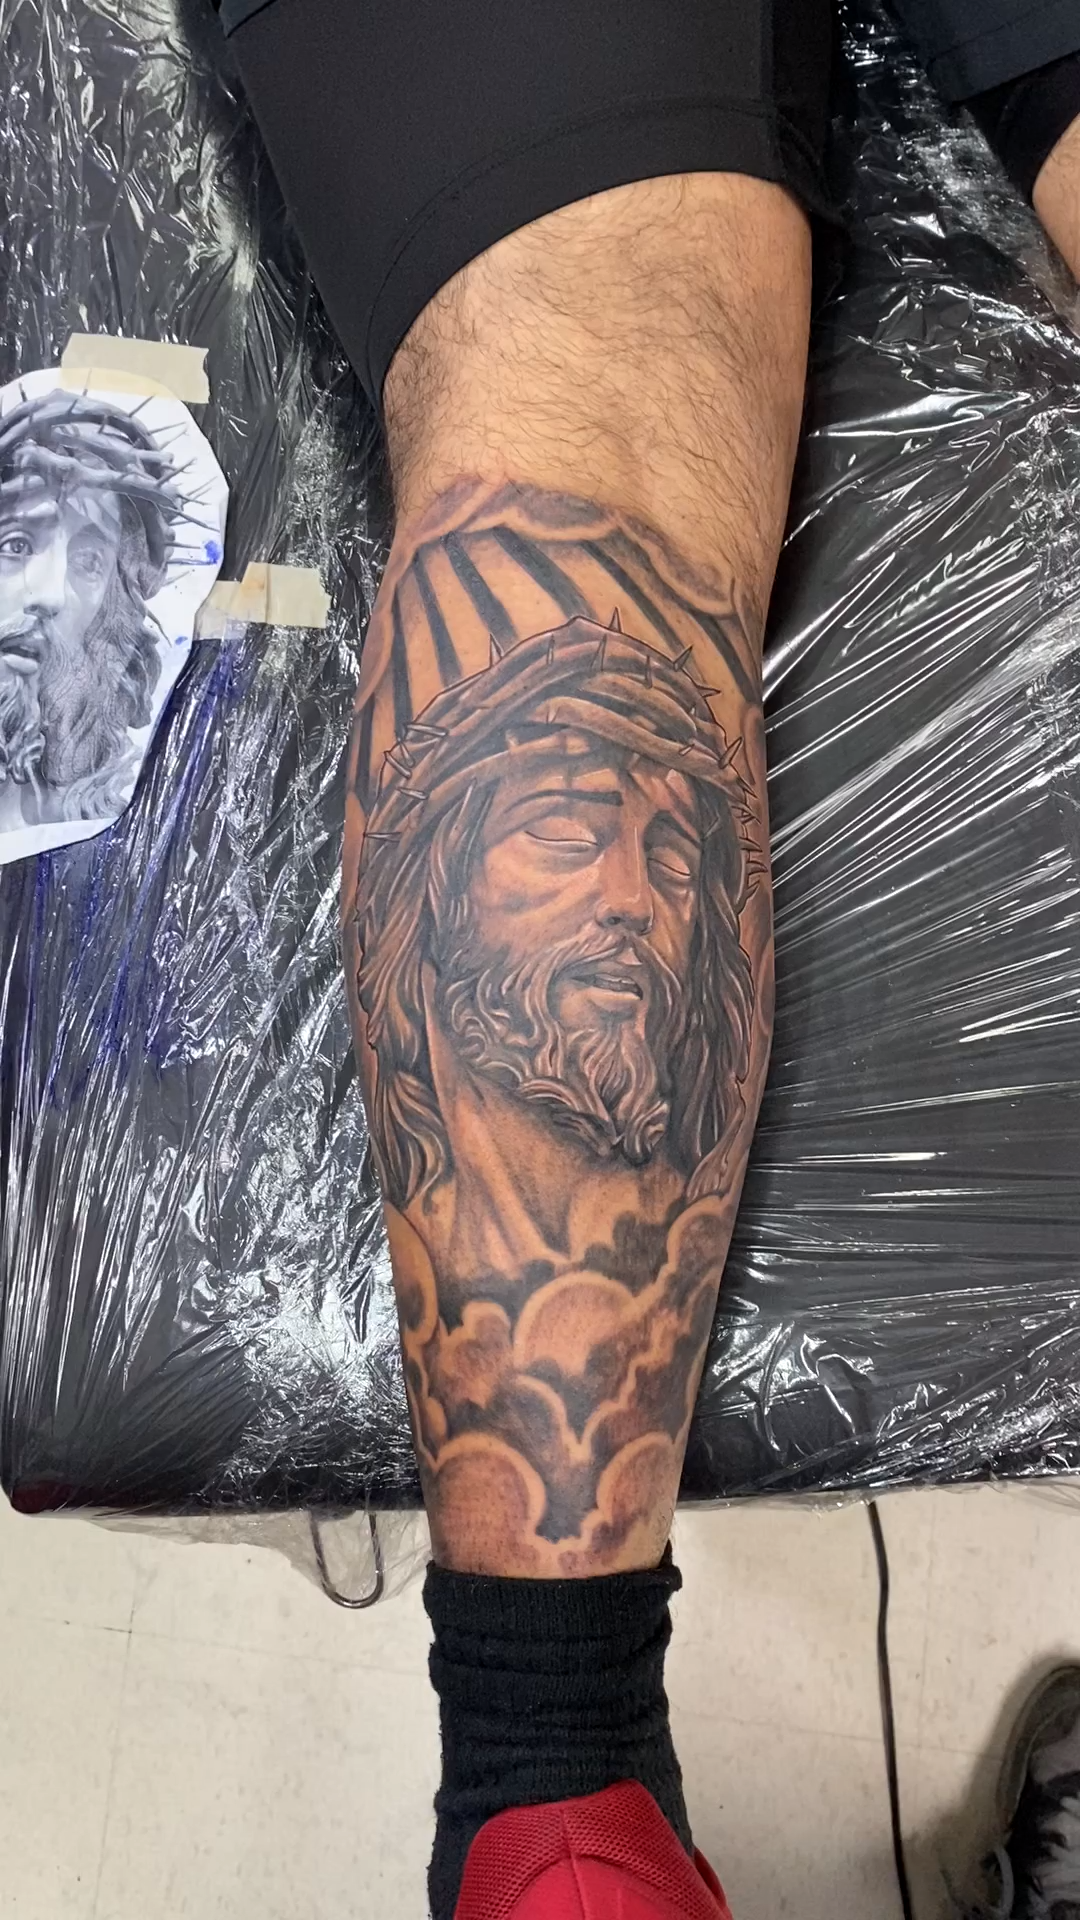 Jesus Tattoos For Men : jesus, tattoos, Jesus, Christ, Crown, Thorns, Tattoos, Badass,, Forearm, Tattoo,